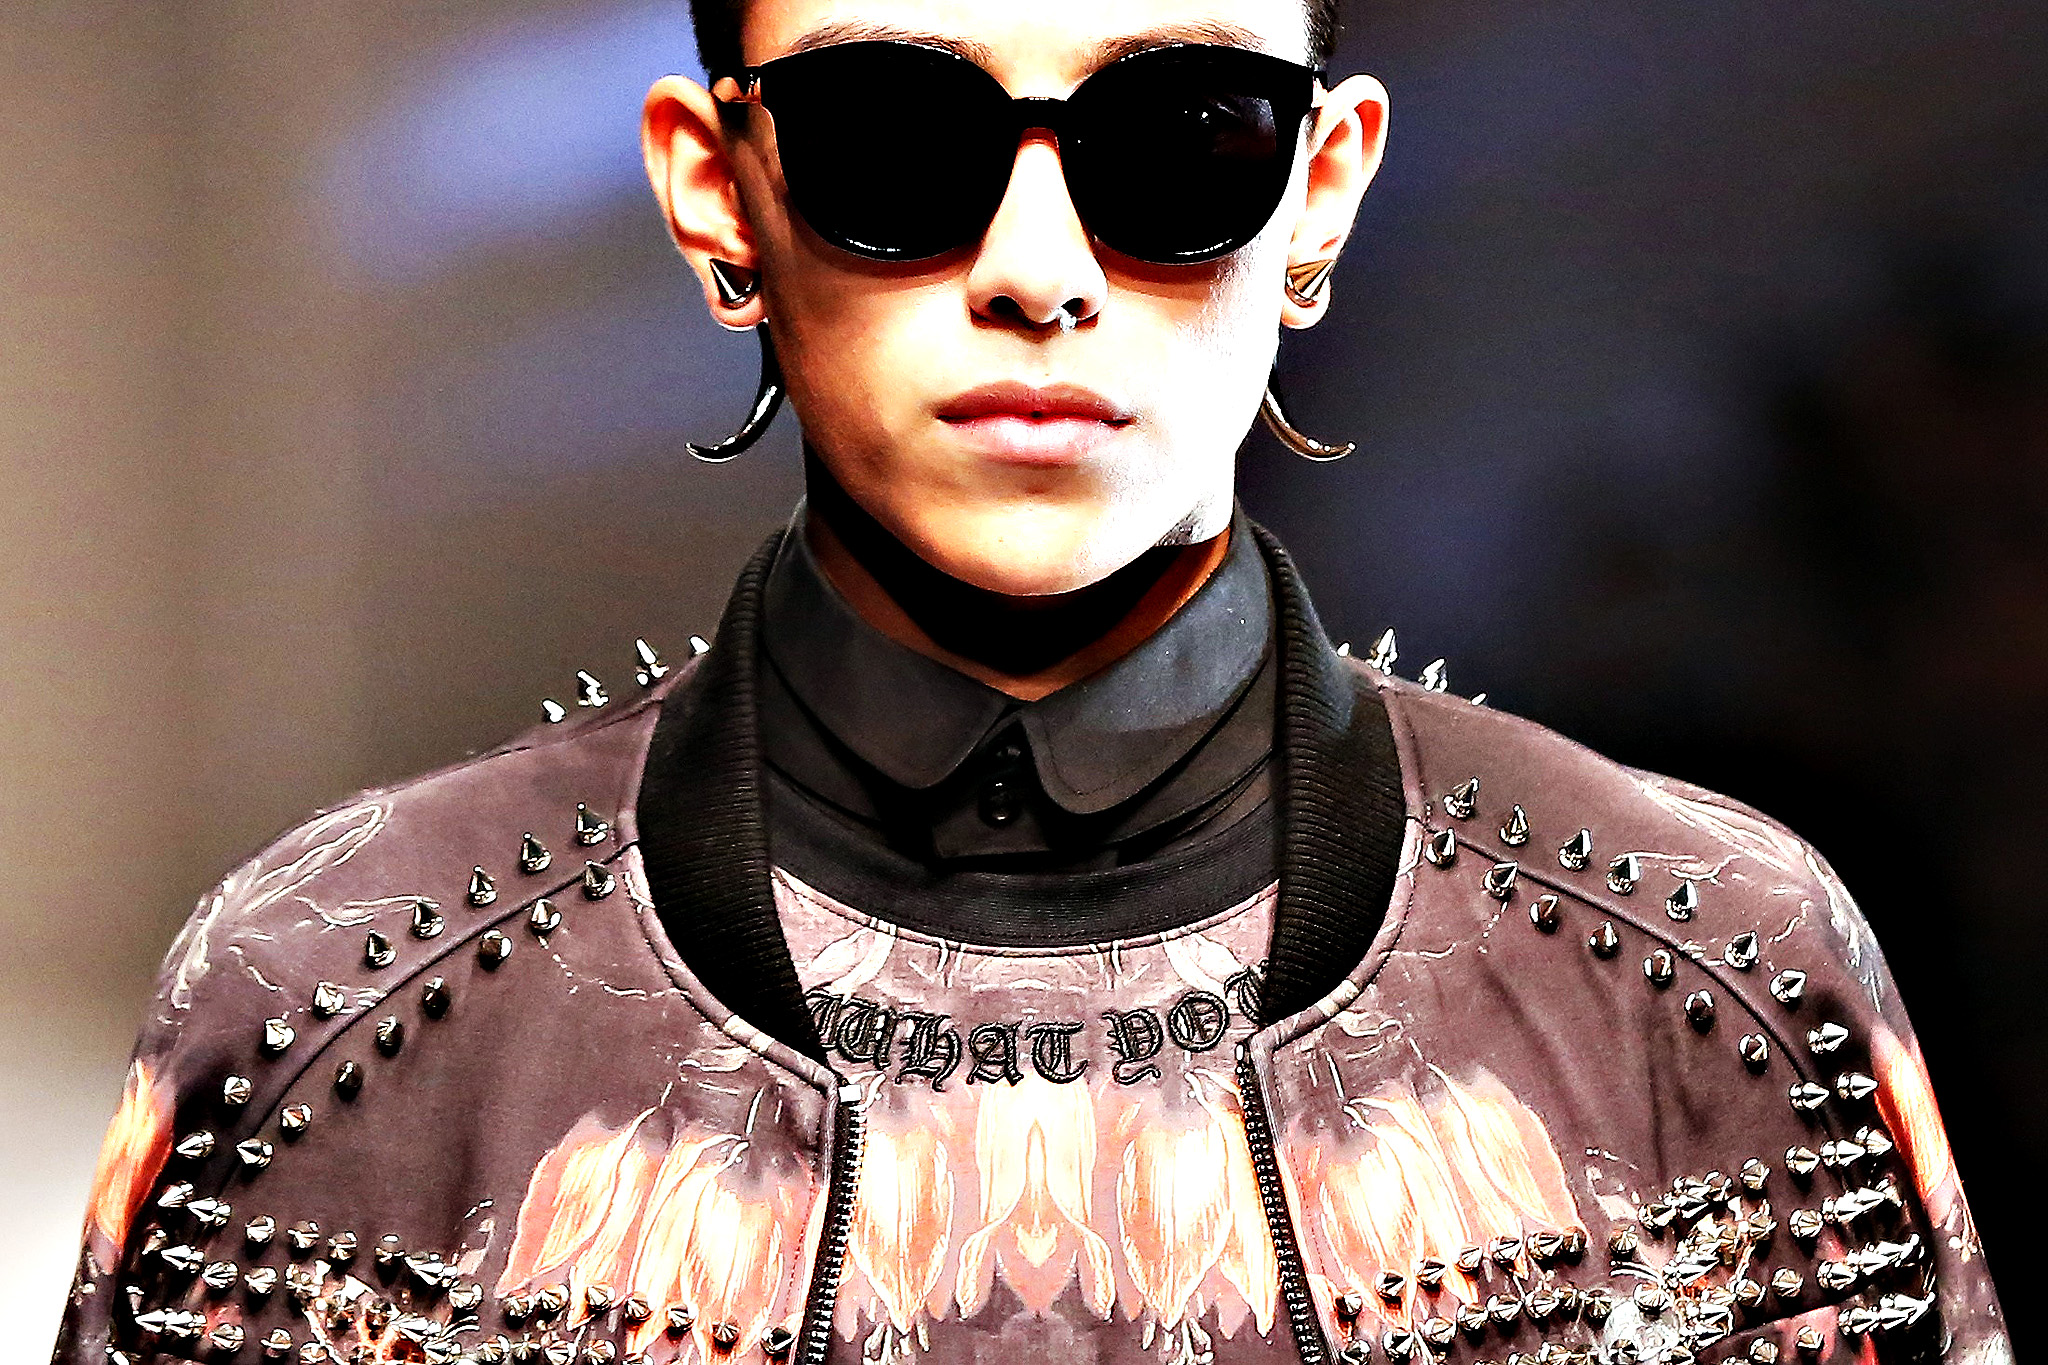 A model presents a creation by Jonny Fu during Shanghai Fashion Week in Shanghai October 17, 2014.